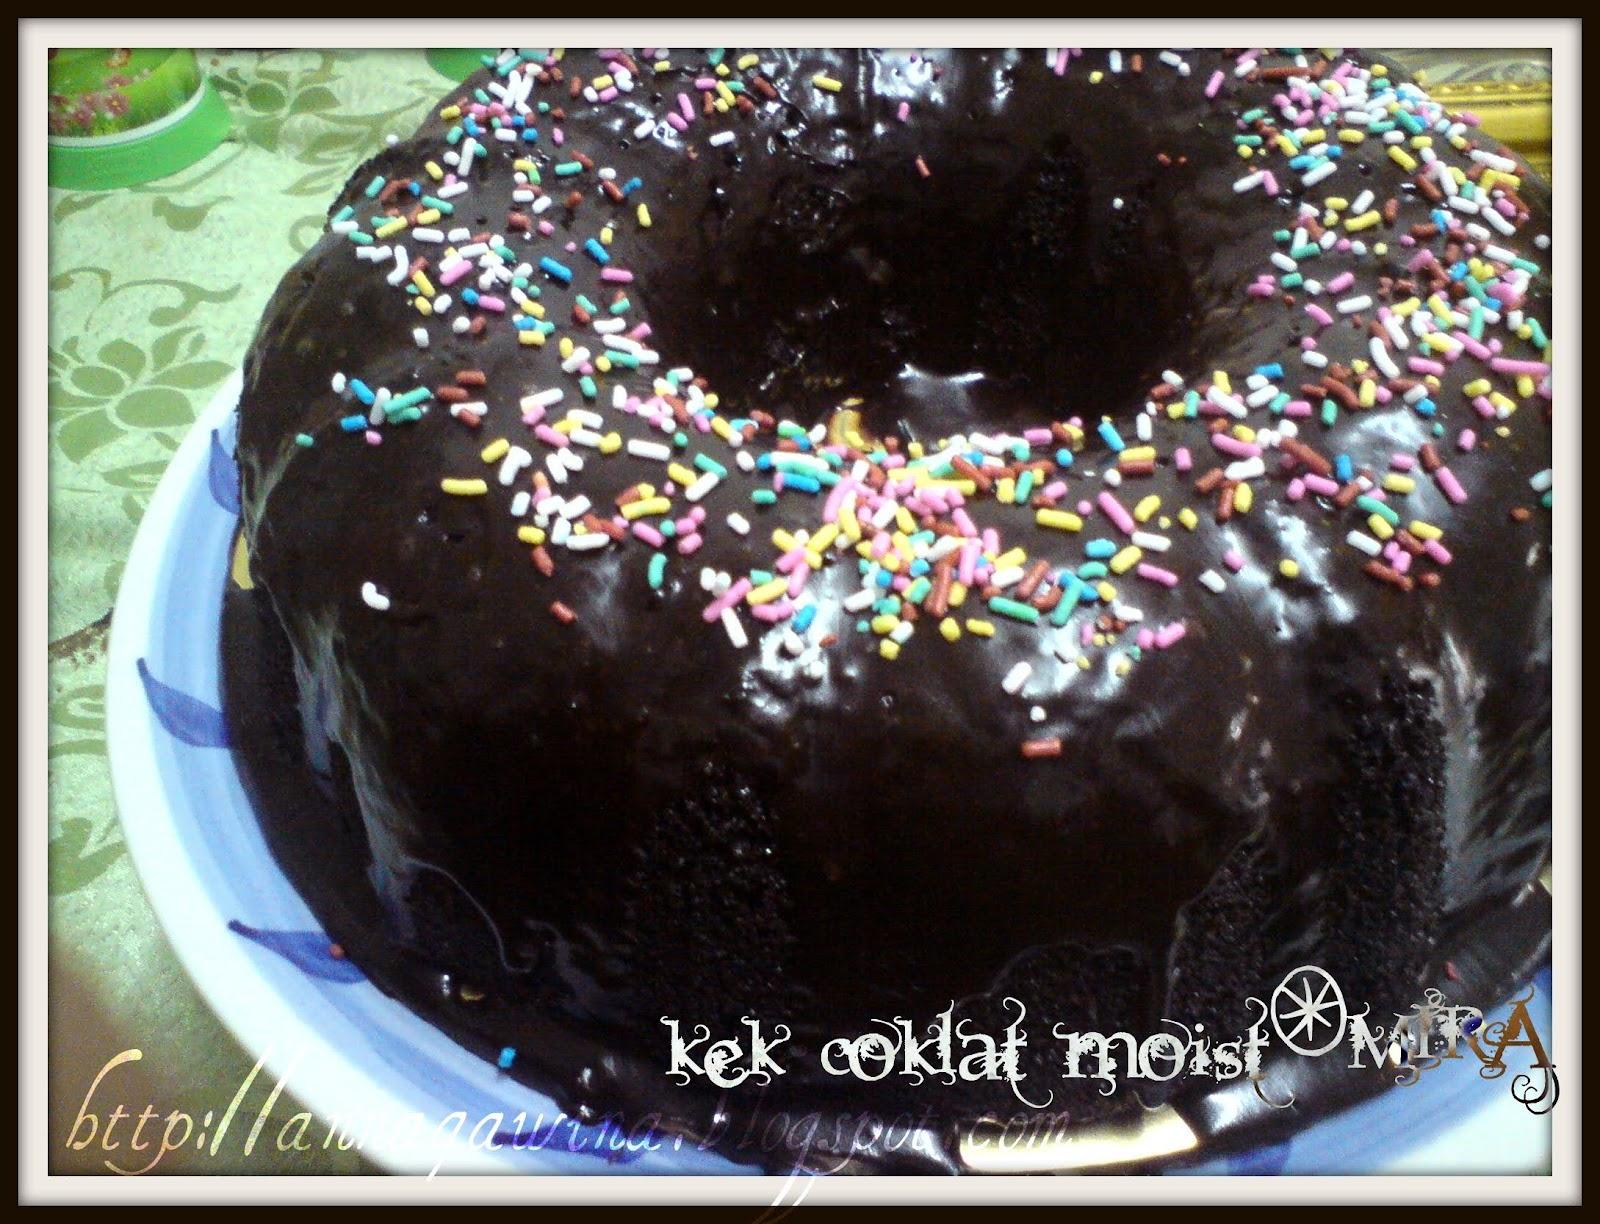 Resepi Kek Coklat Moist Dan Cara Buat Topping Kek